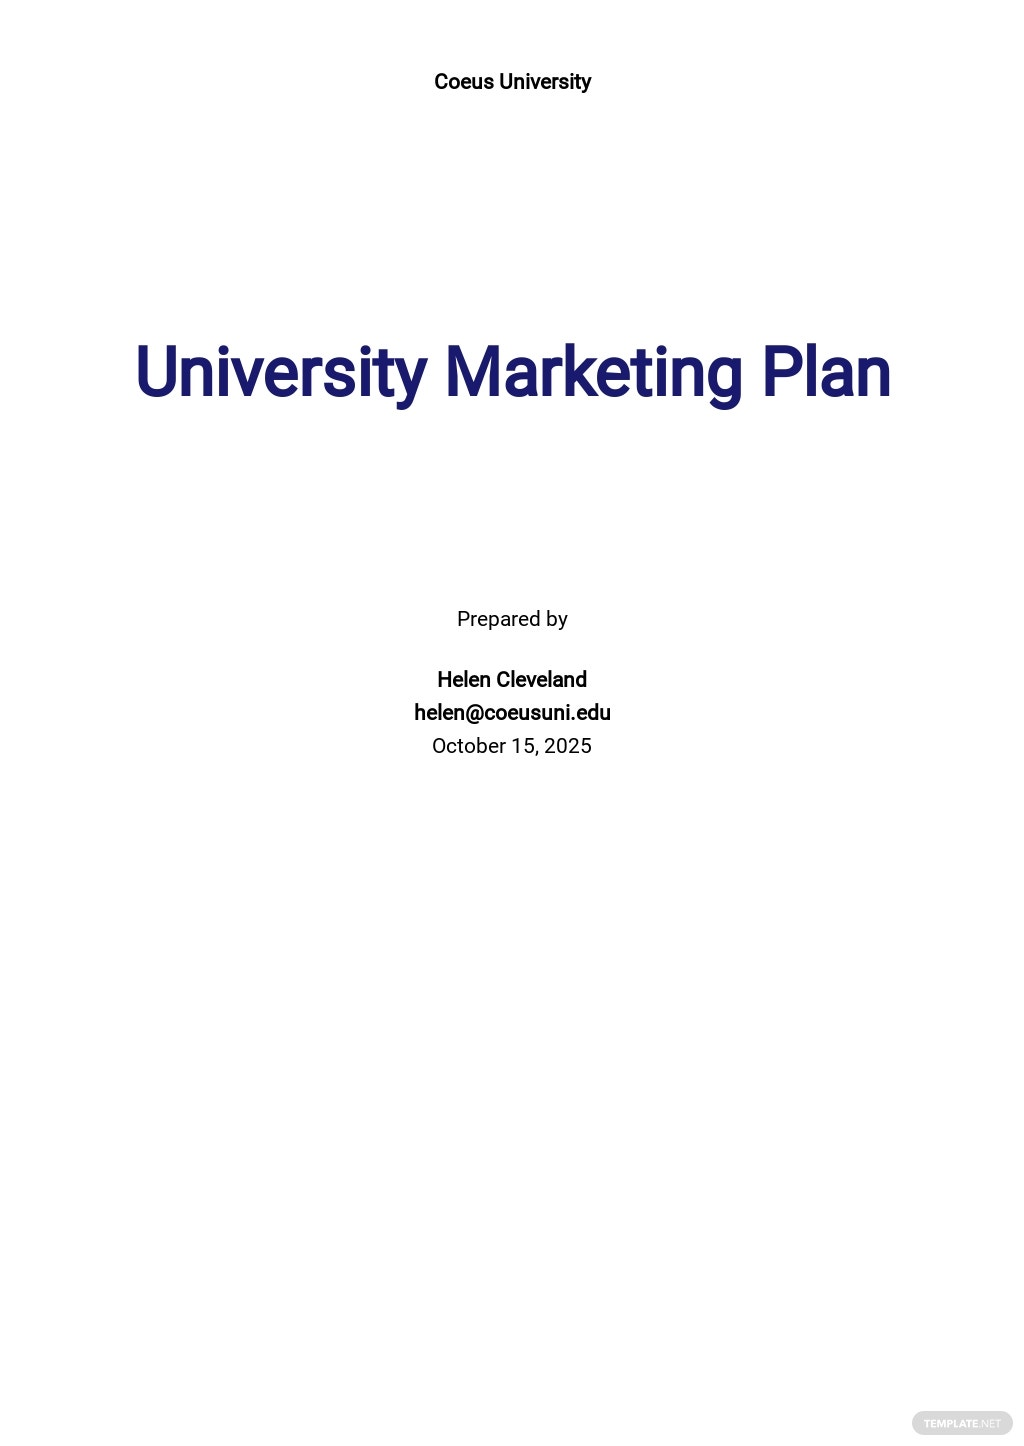 University Marketing Plan Template.jpe